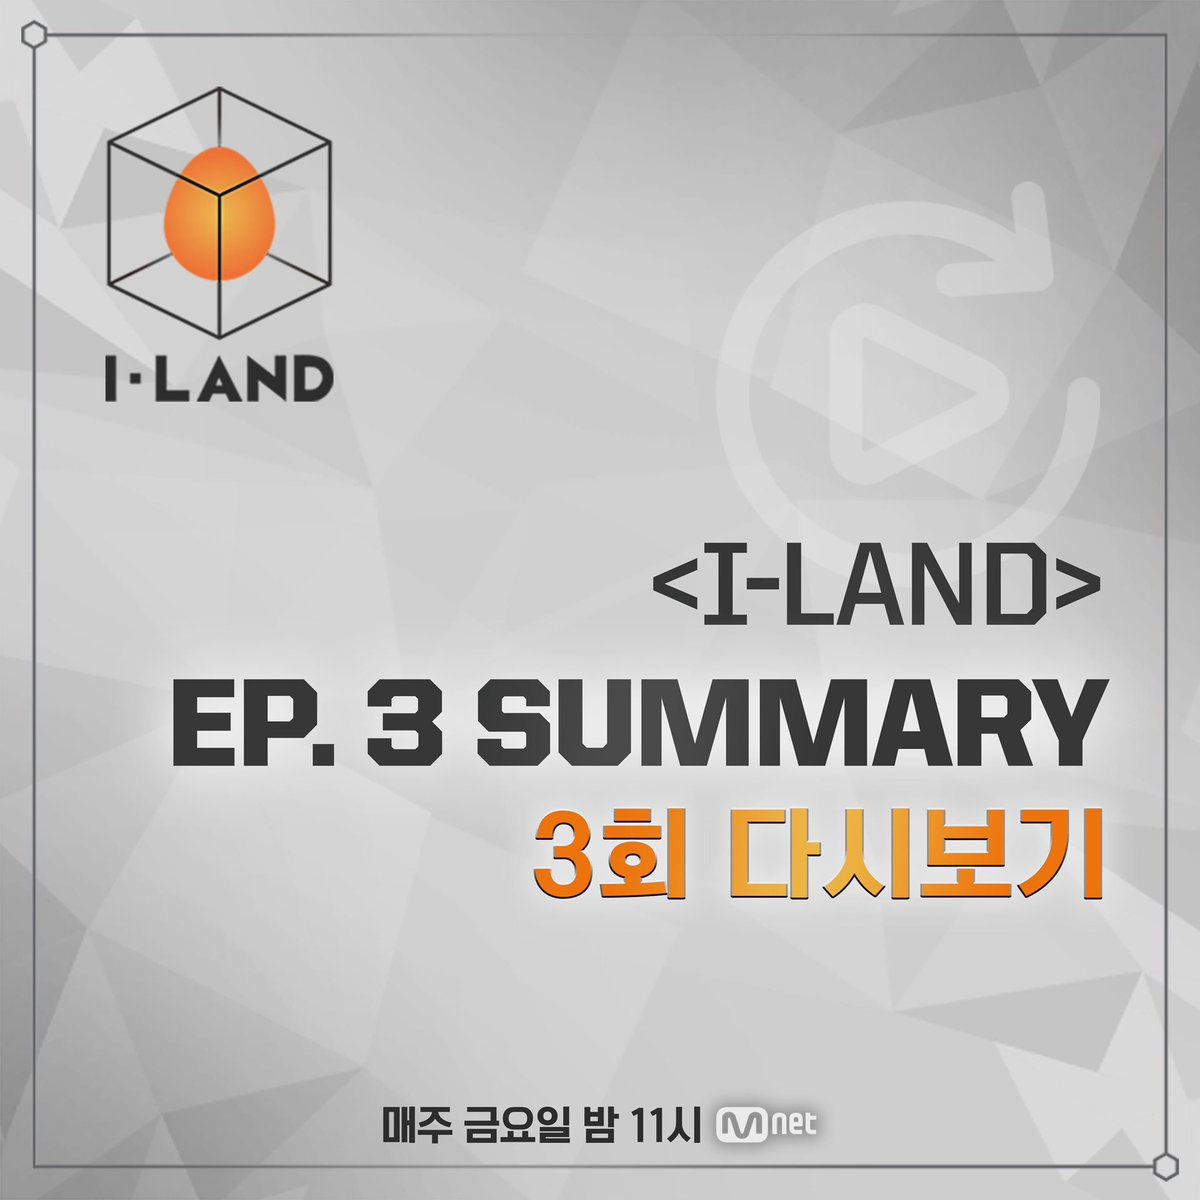 I-SUMMARY <I-LAND> 3회 다시보기 #1 드디어 밝혀진 'I-LAND'에서의 방출자와 충원자 6인! 그리고 이어진 <I-LAND> 두 번째 테스트 무대! 과연 그 결과는? Every Friday 11PM(KST) Mnet #Mnet #엠넷 #ILAND #I_LAND #아이랜드 #Summary #다시보기